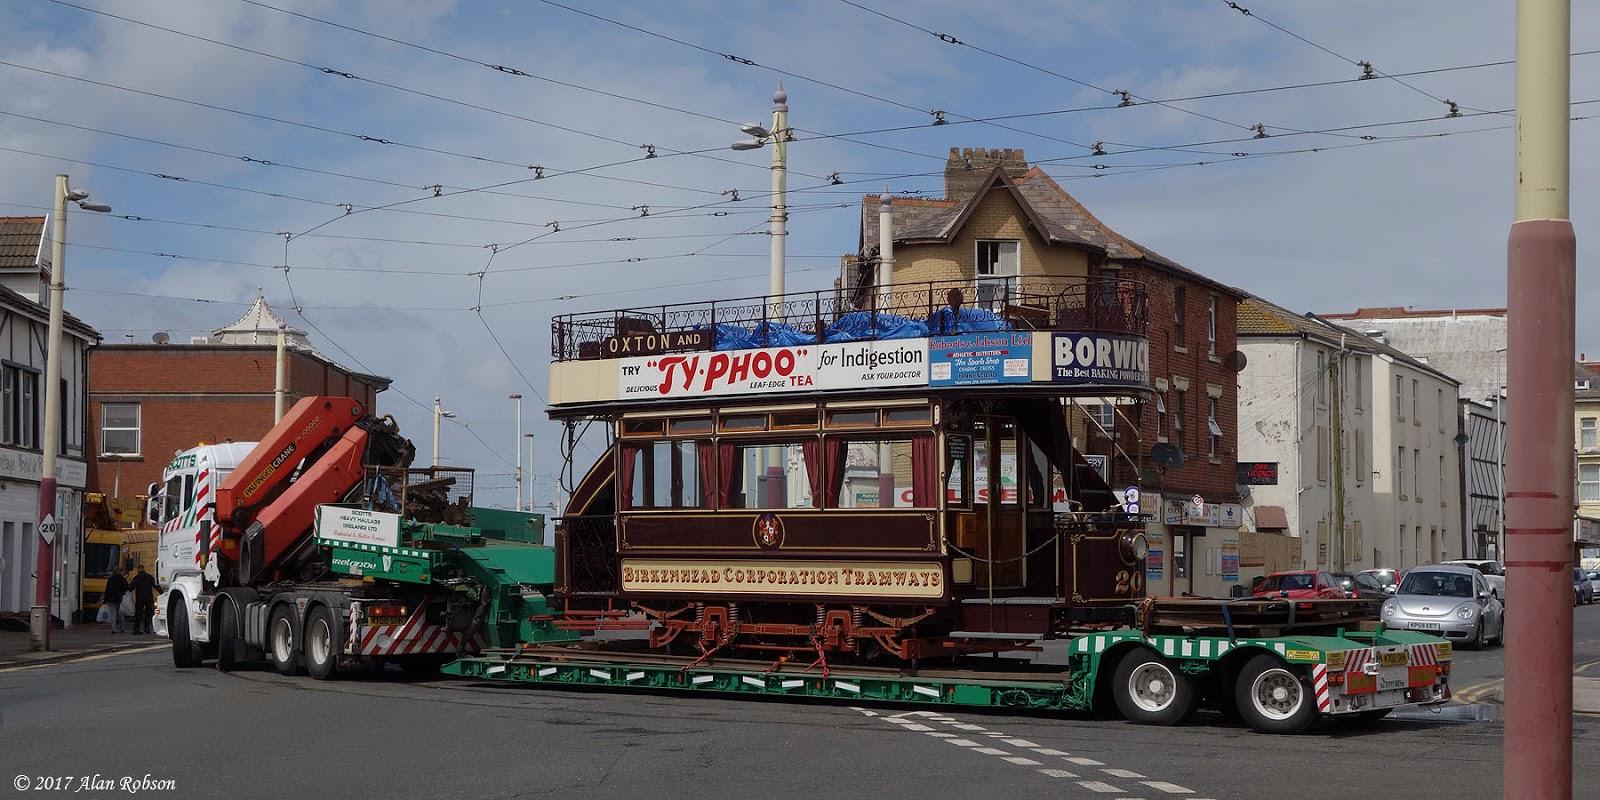 Blackpool Tram Blog: The arrival of Birkenhead 20